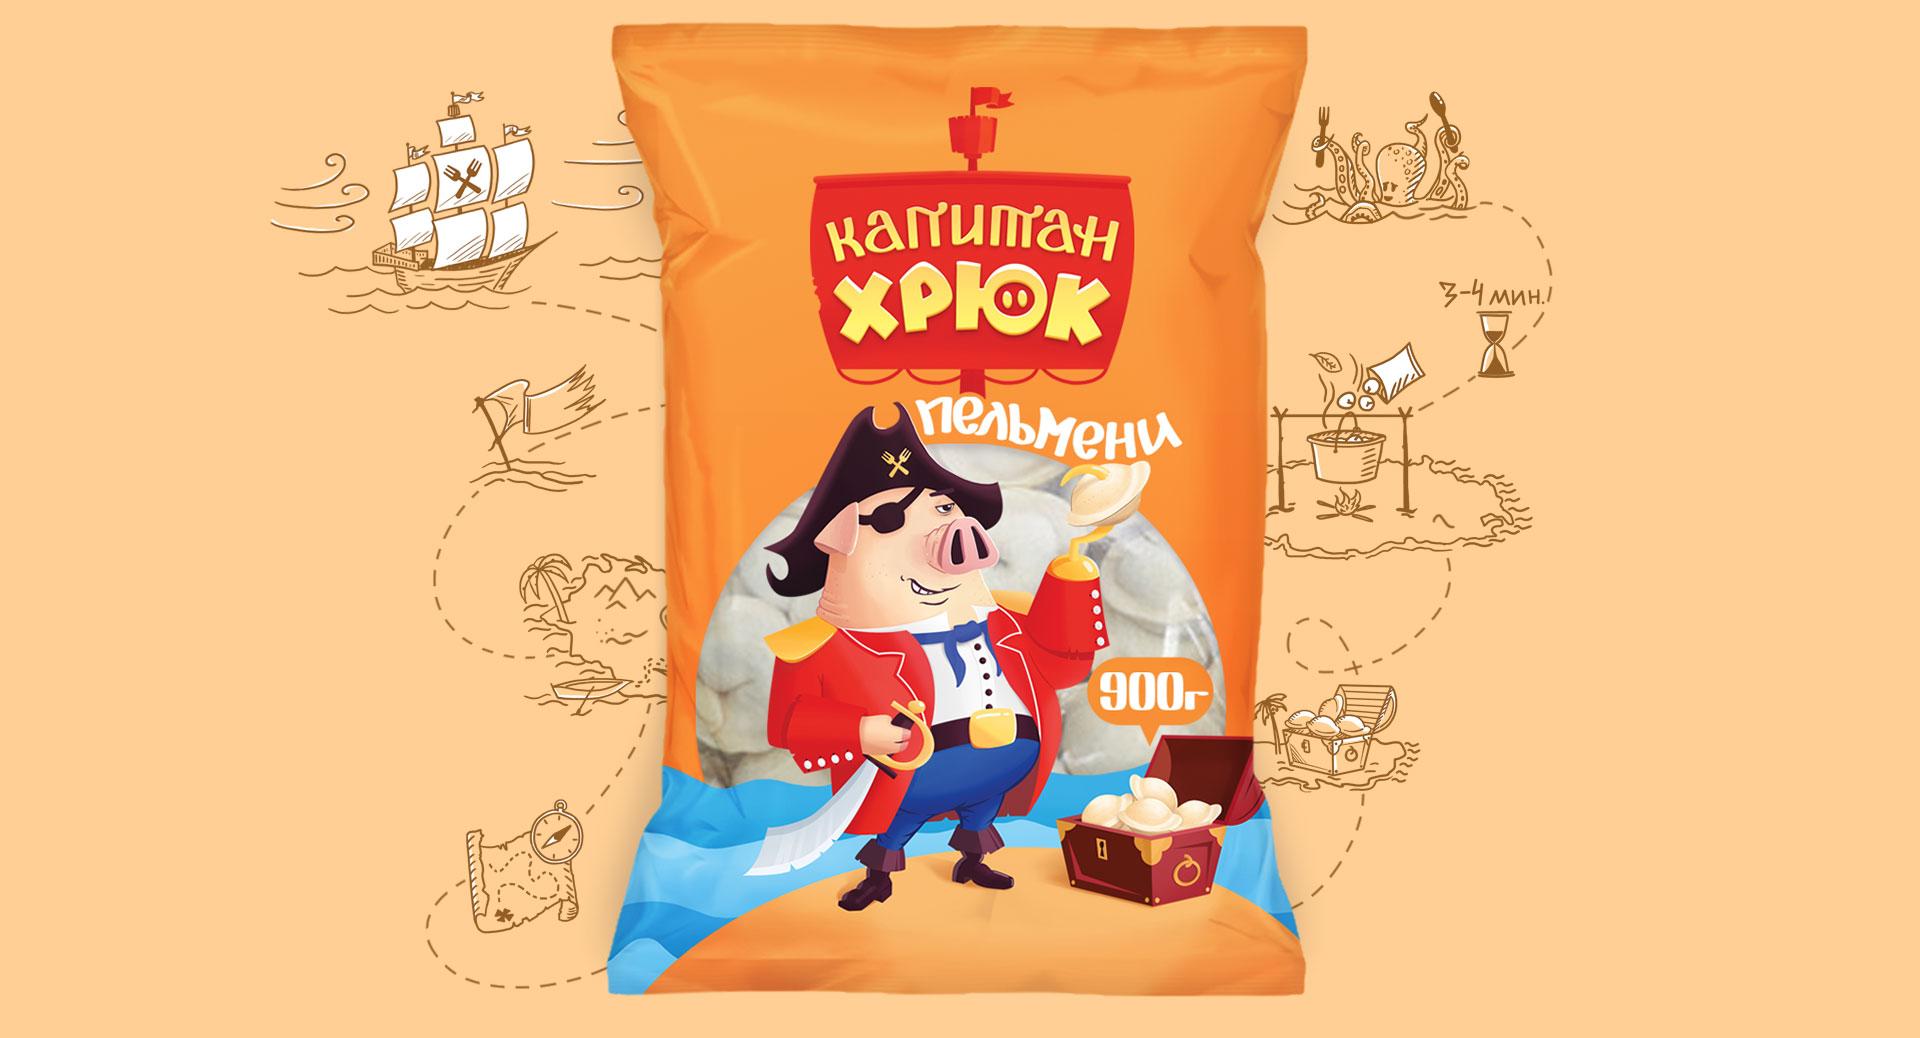 Упаковка пельменей Капитан Хрюк